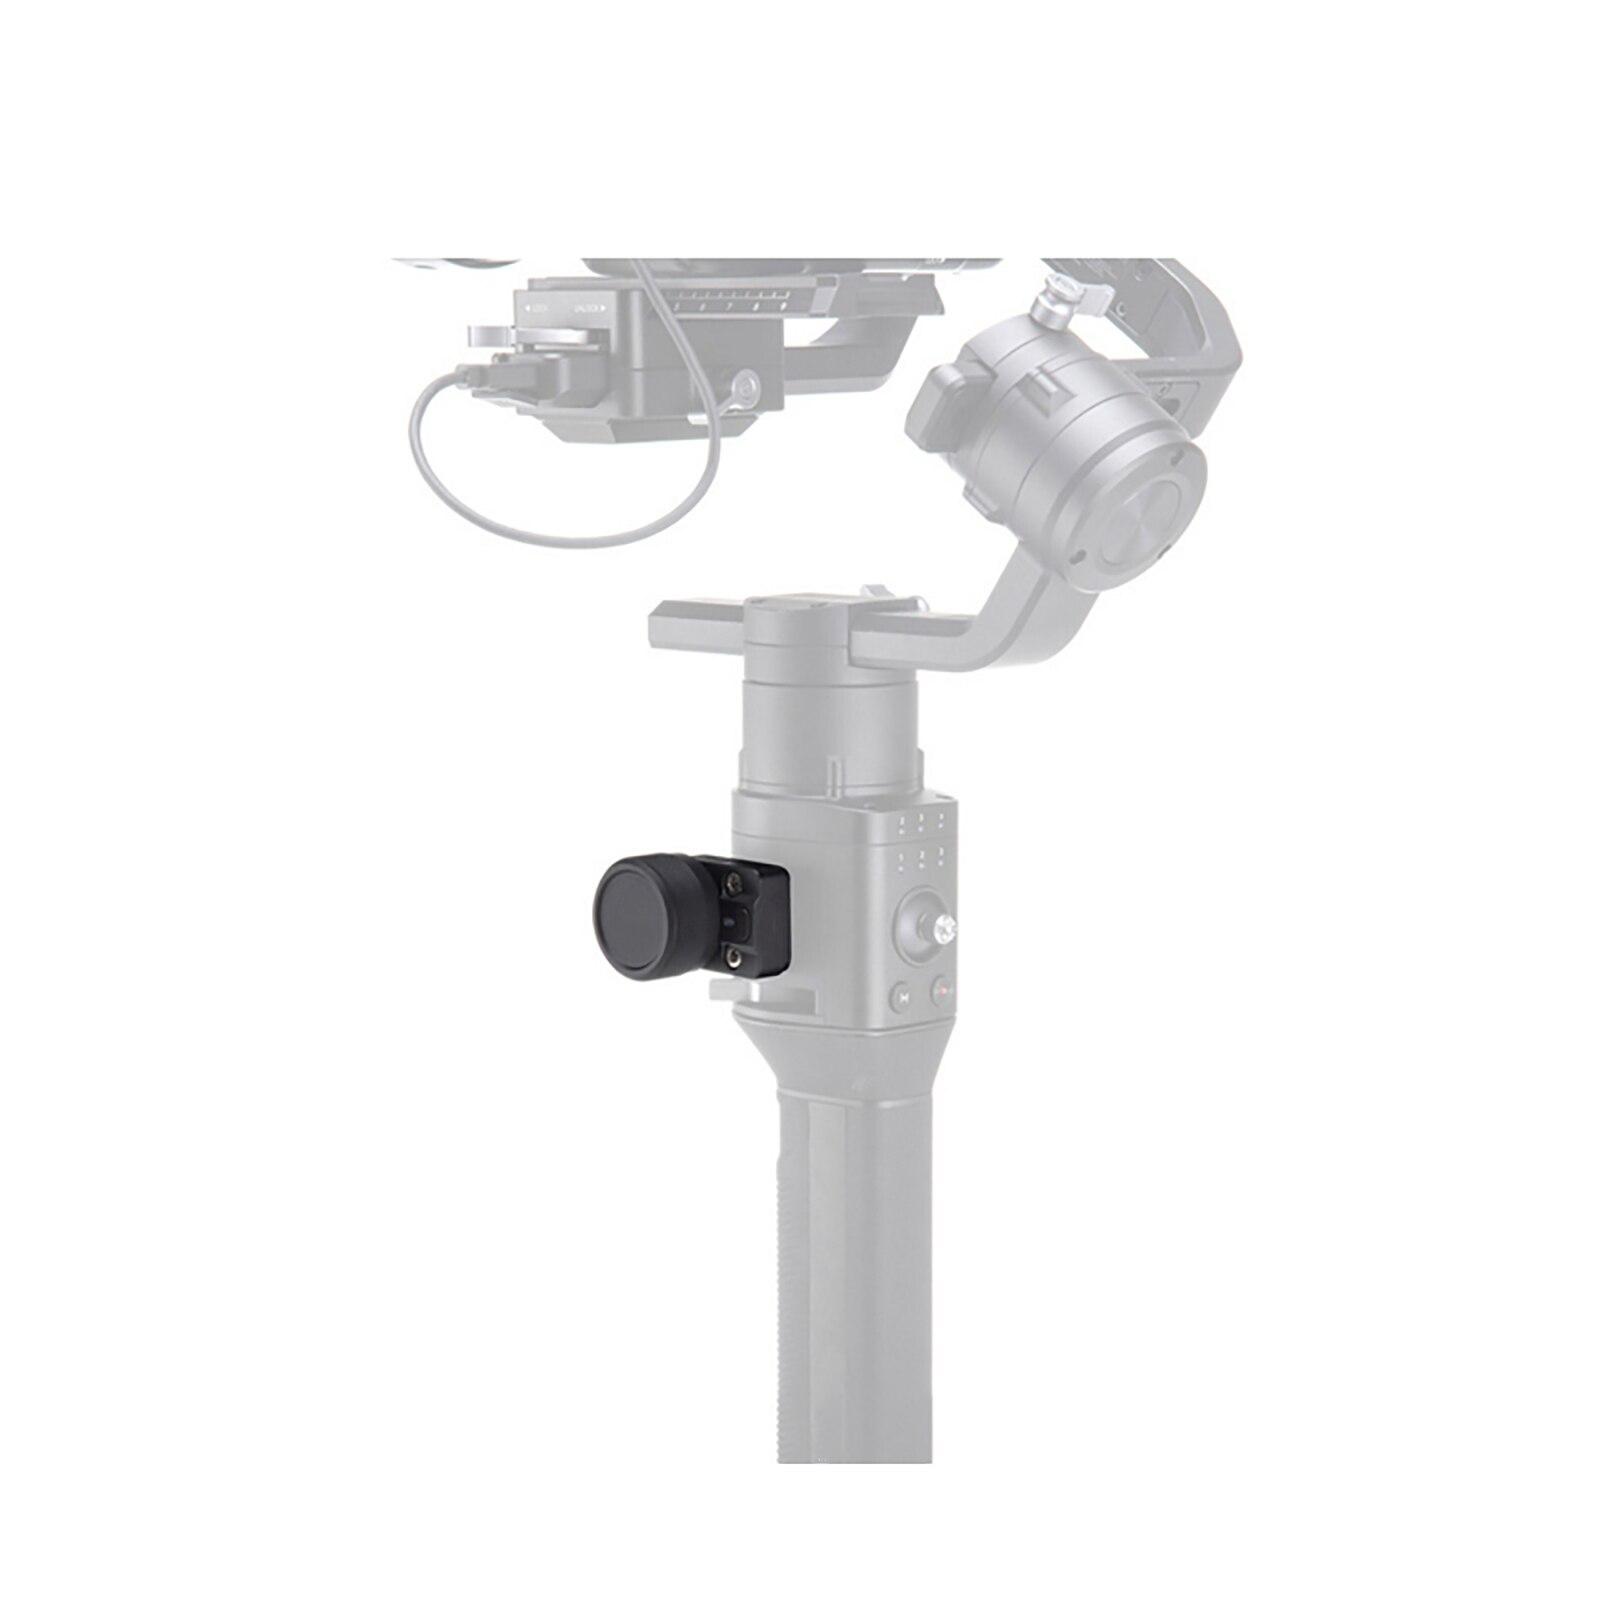 For DJI Ronin S Focus Wheel Mounts 8 pin Interface for Ronin S Handle Control Camera